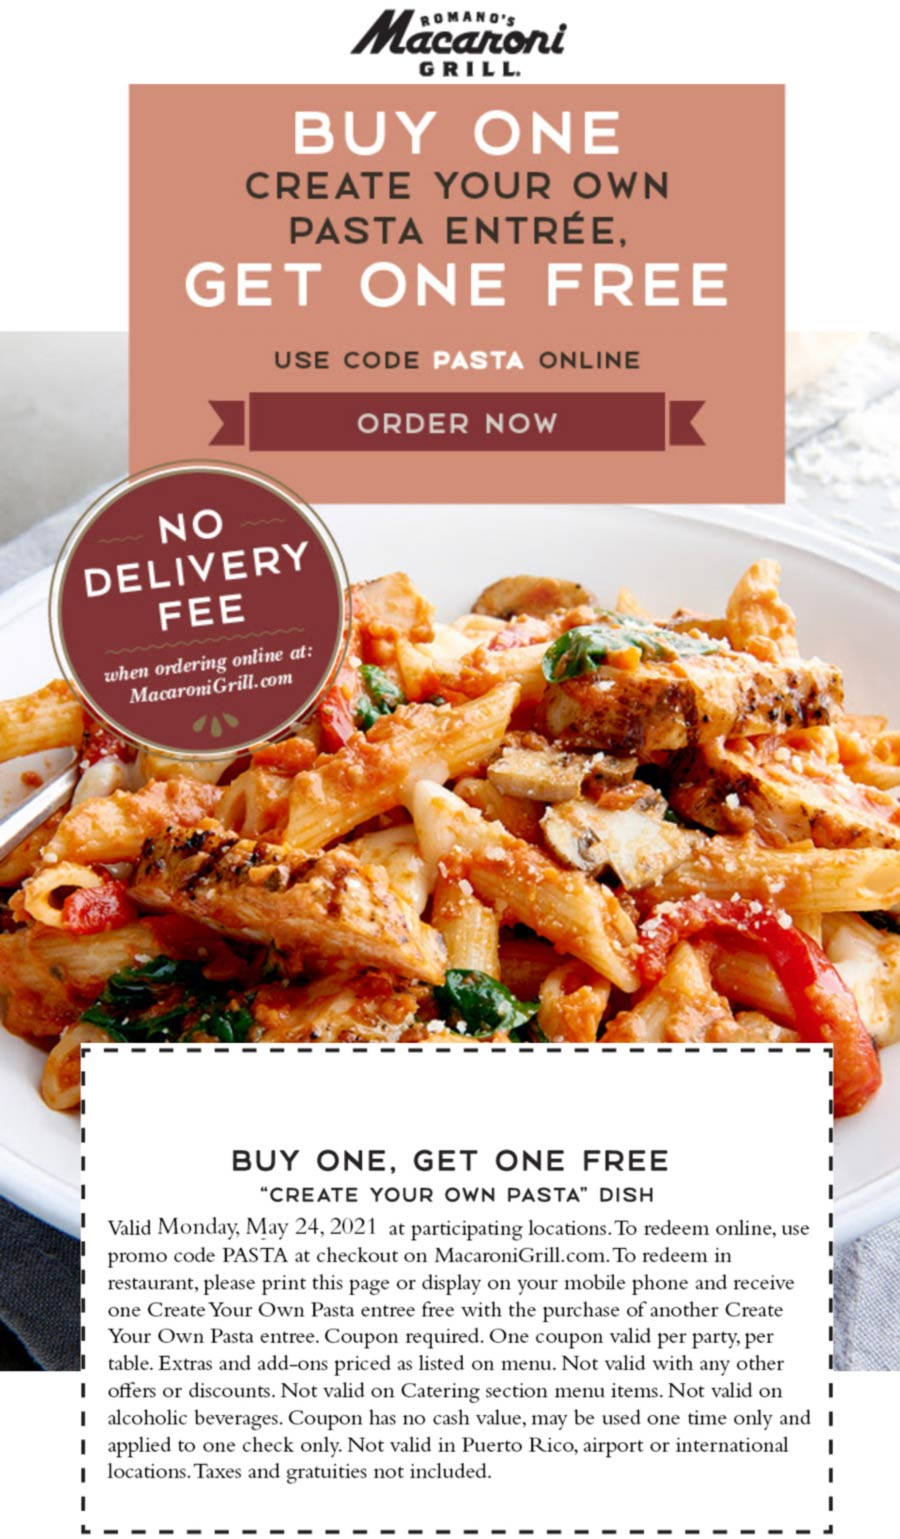 Macaroni Grill restaurants Coupon  Second pasta entree free today at Macaroni Grill #macaronigrill